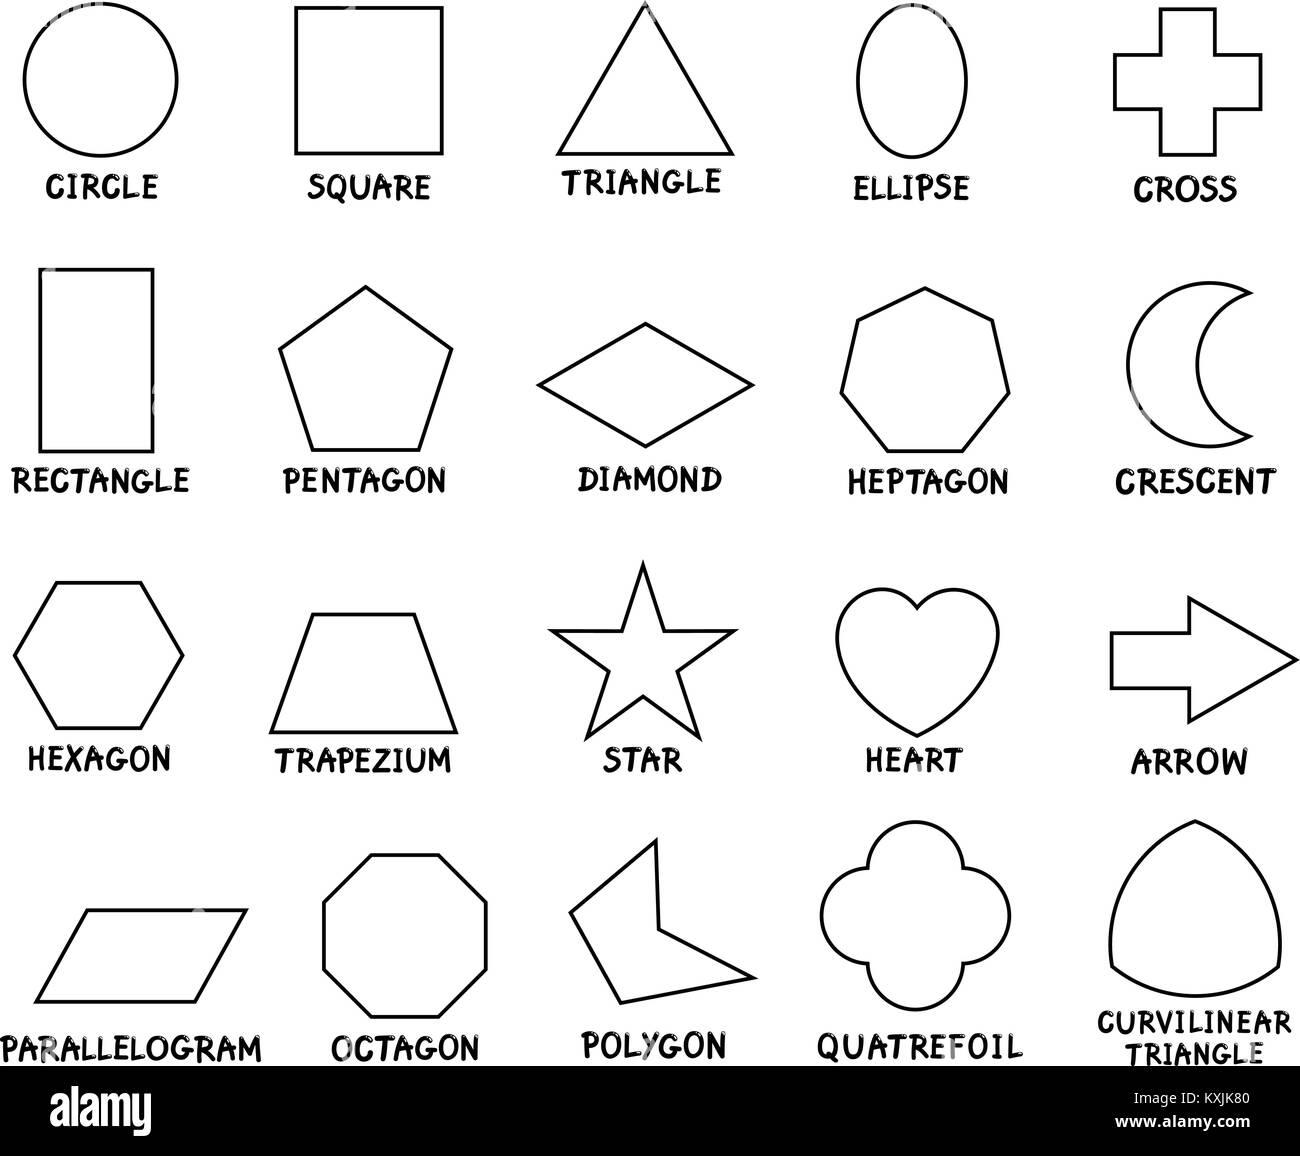 Curvilinear Triangle Stock Photos Amp Curvilinear Triangle